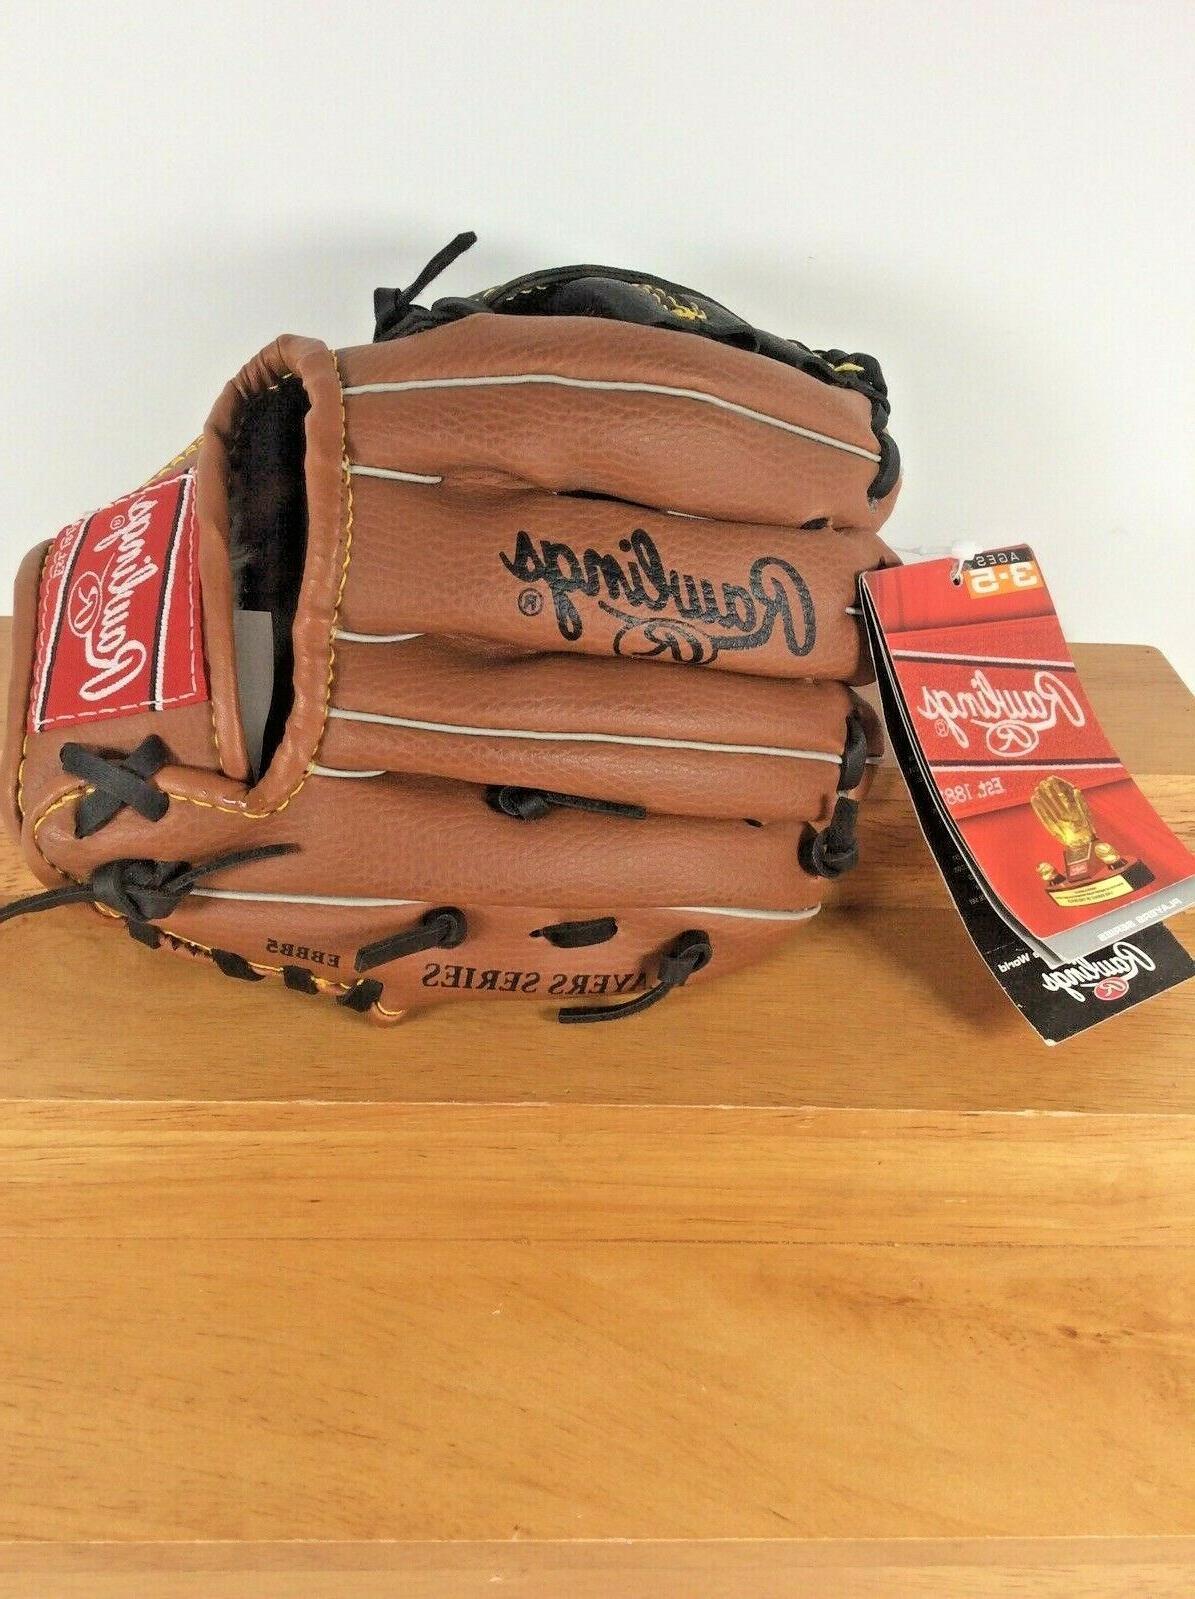 new youth baseball glove mitt 8 5